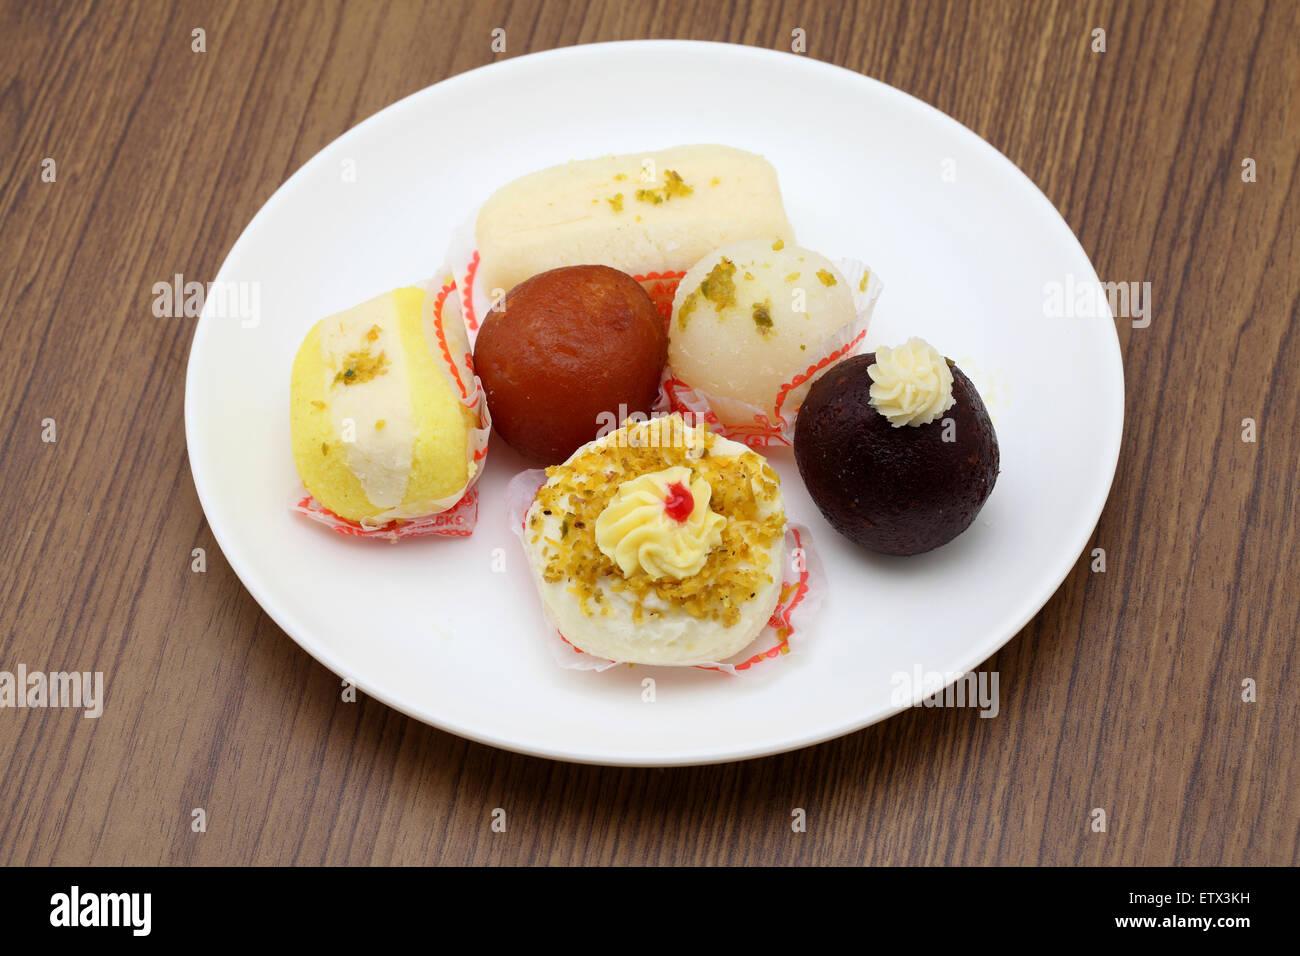 Indian sweets of gulab jamoon and rasgulla - Stock Image